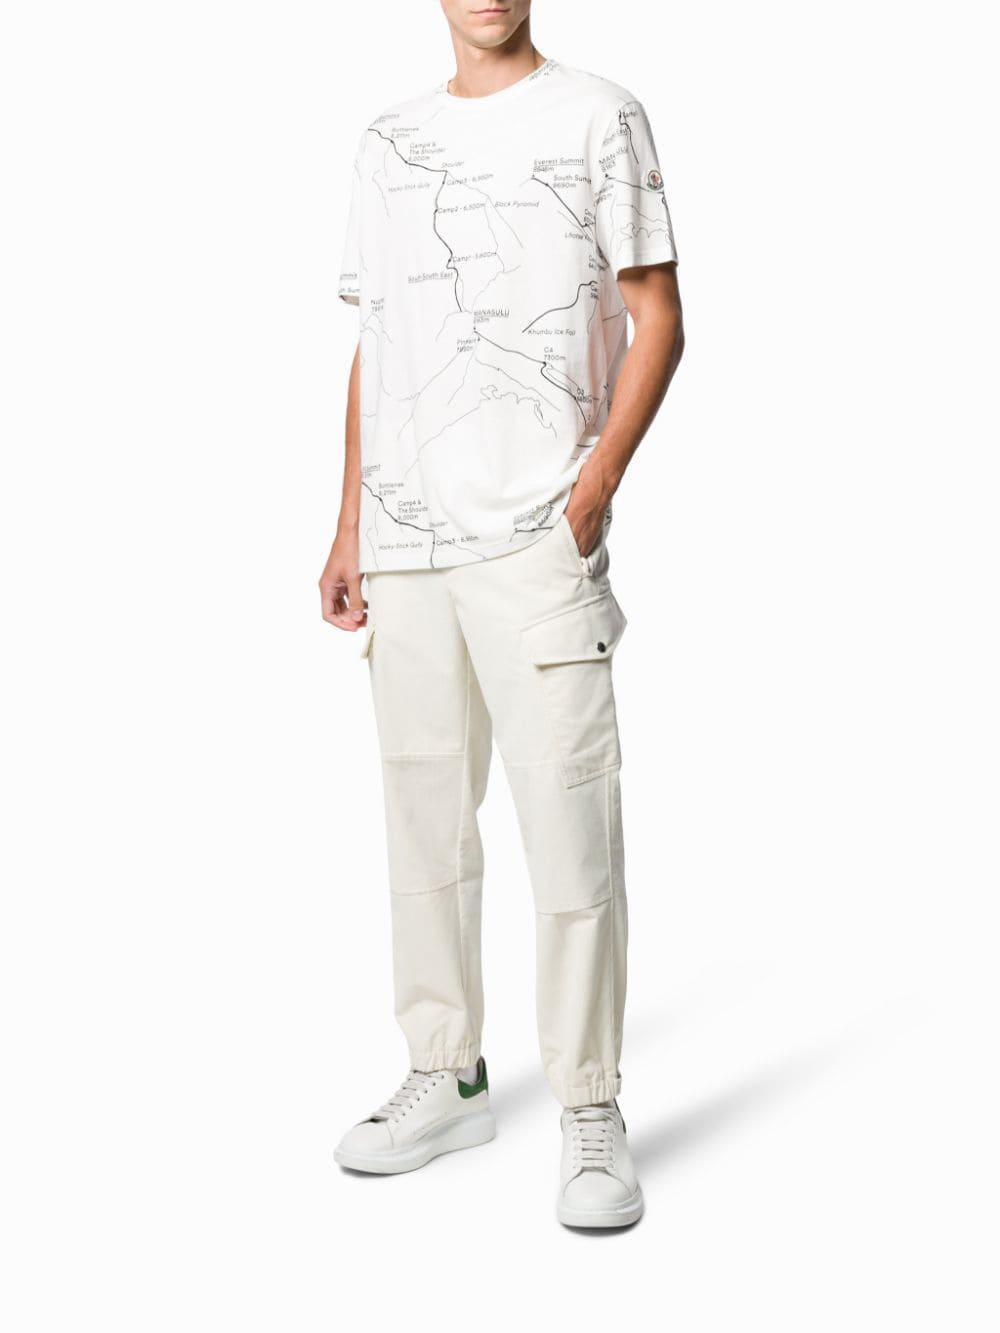 velvet striped Moncler Genius 1952 trousers MONCLER GENIUS |  | 11475-00-54AEJ050